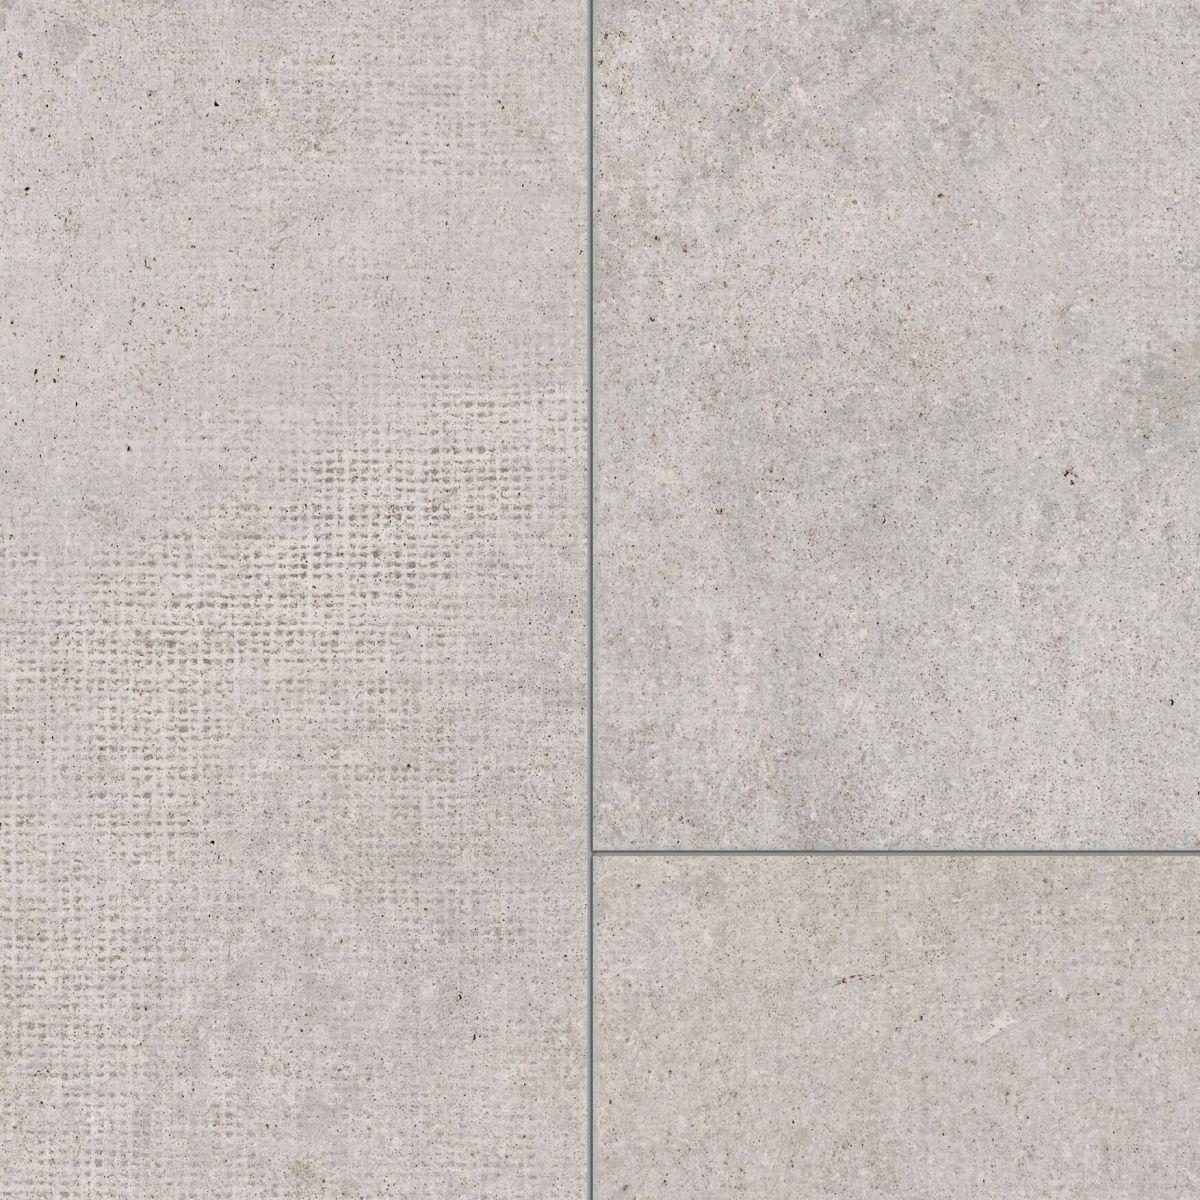 Avatara vloeren steen O2 detail